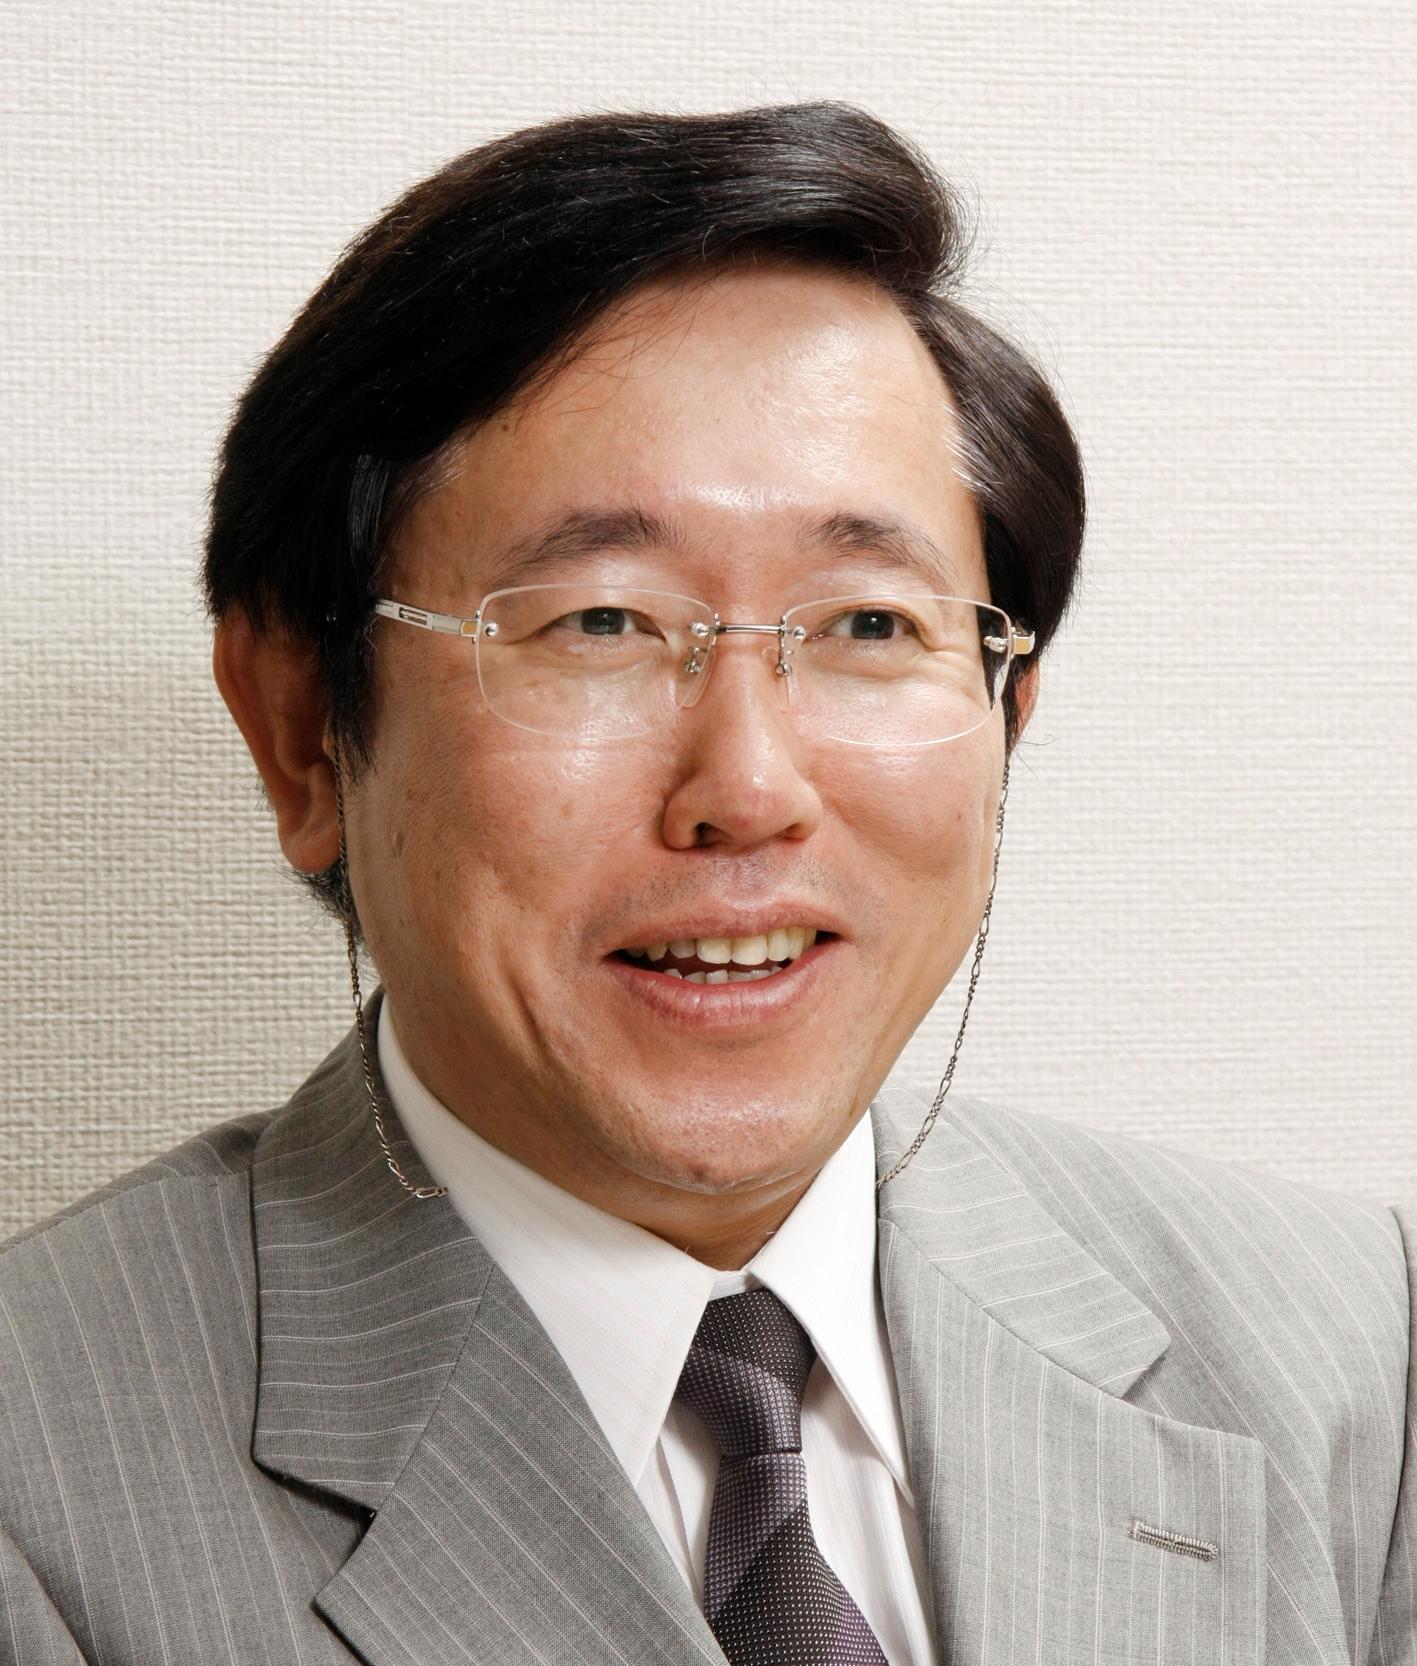 Yusuke Tanigawara